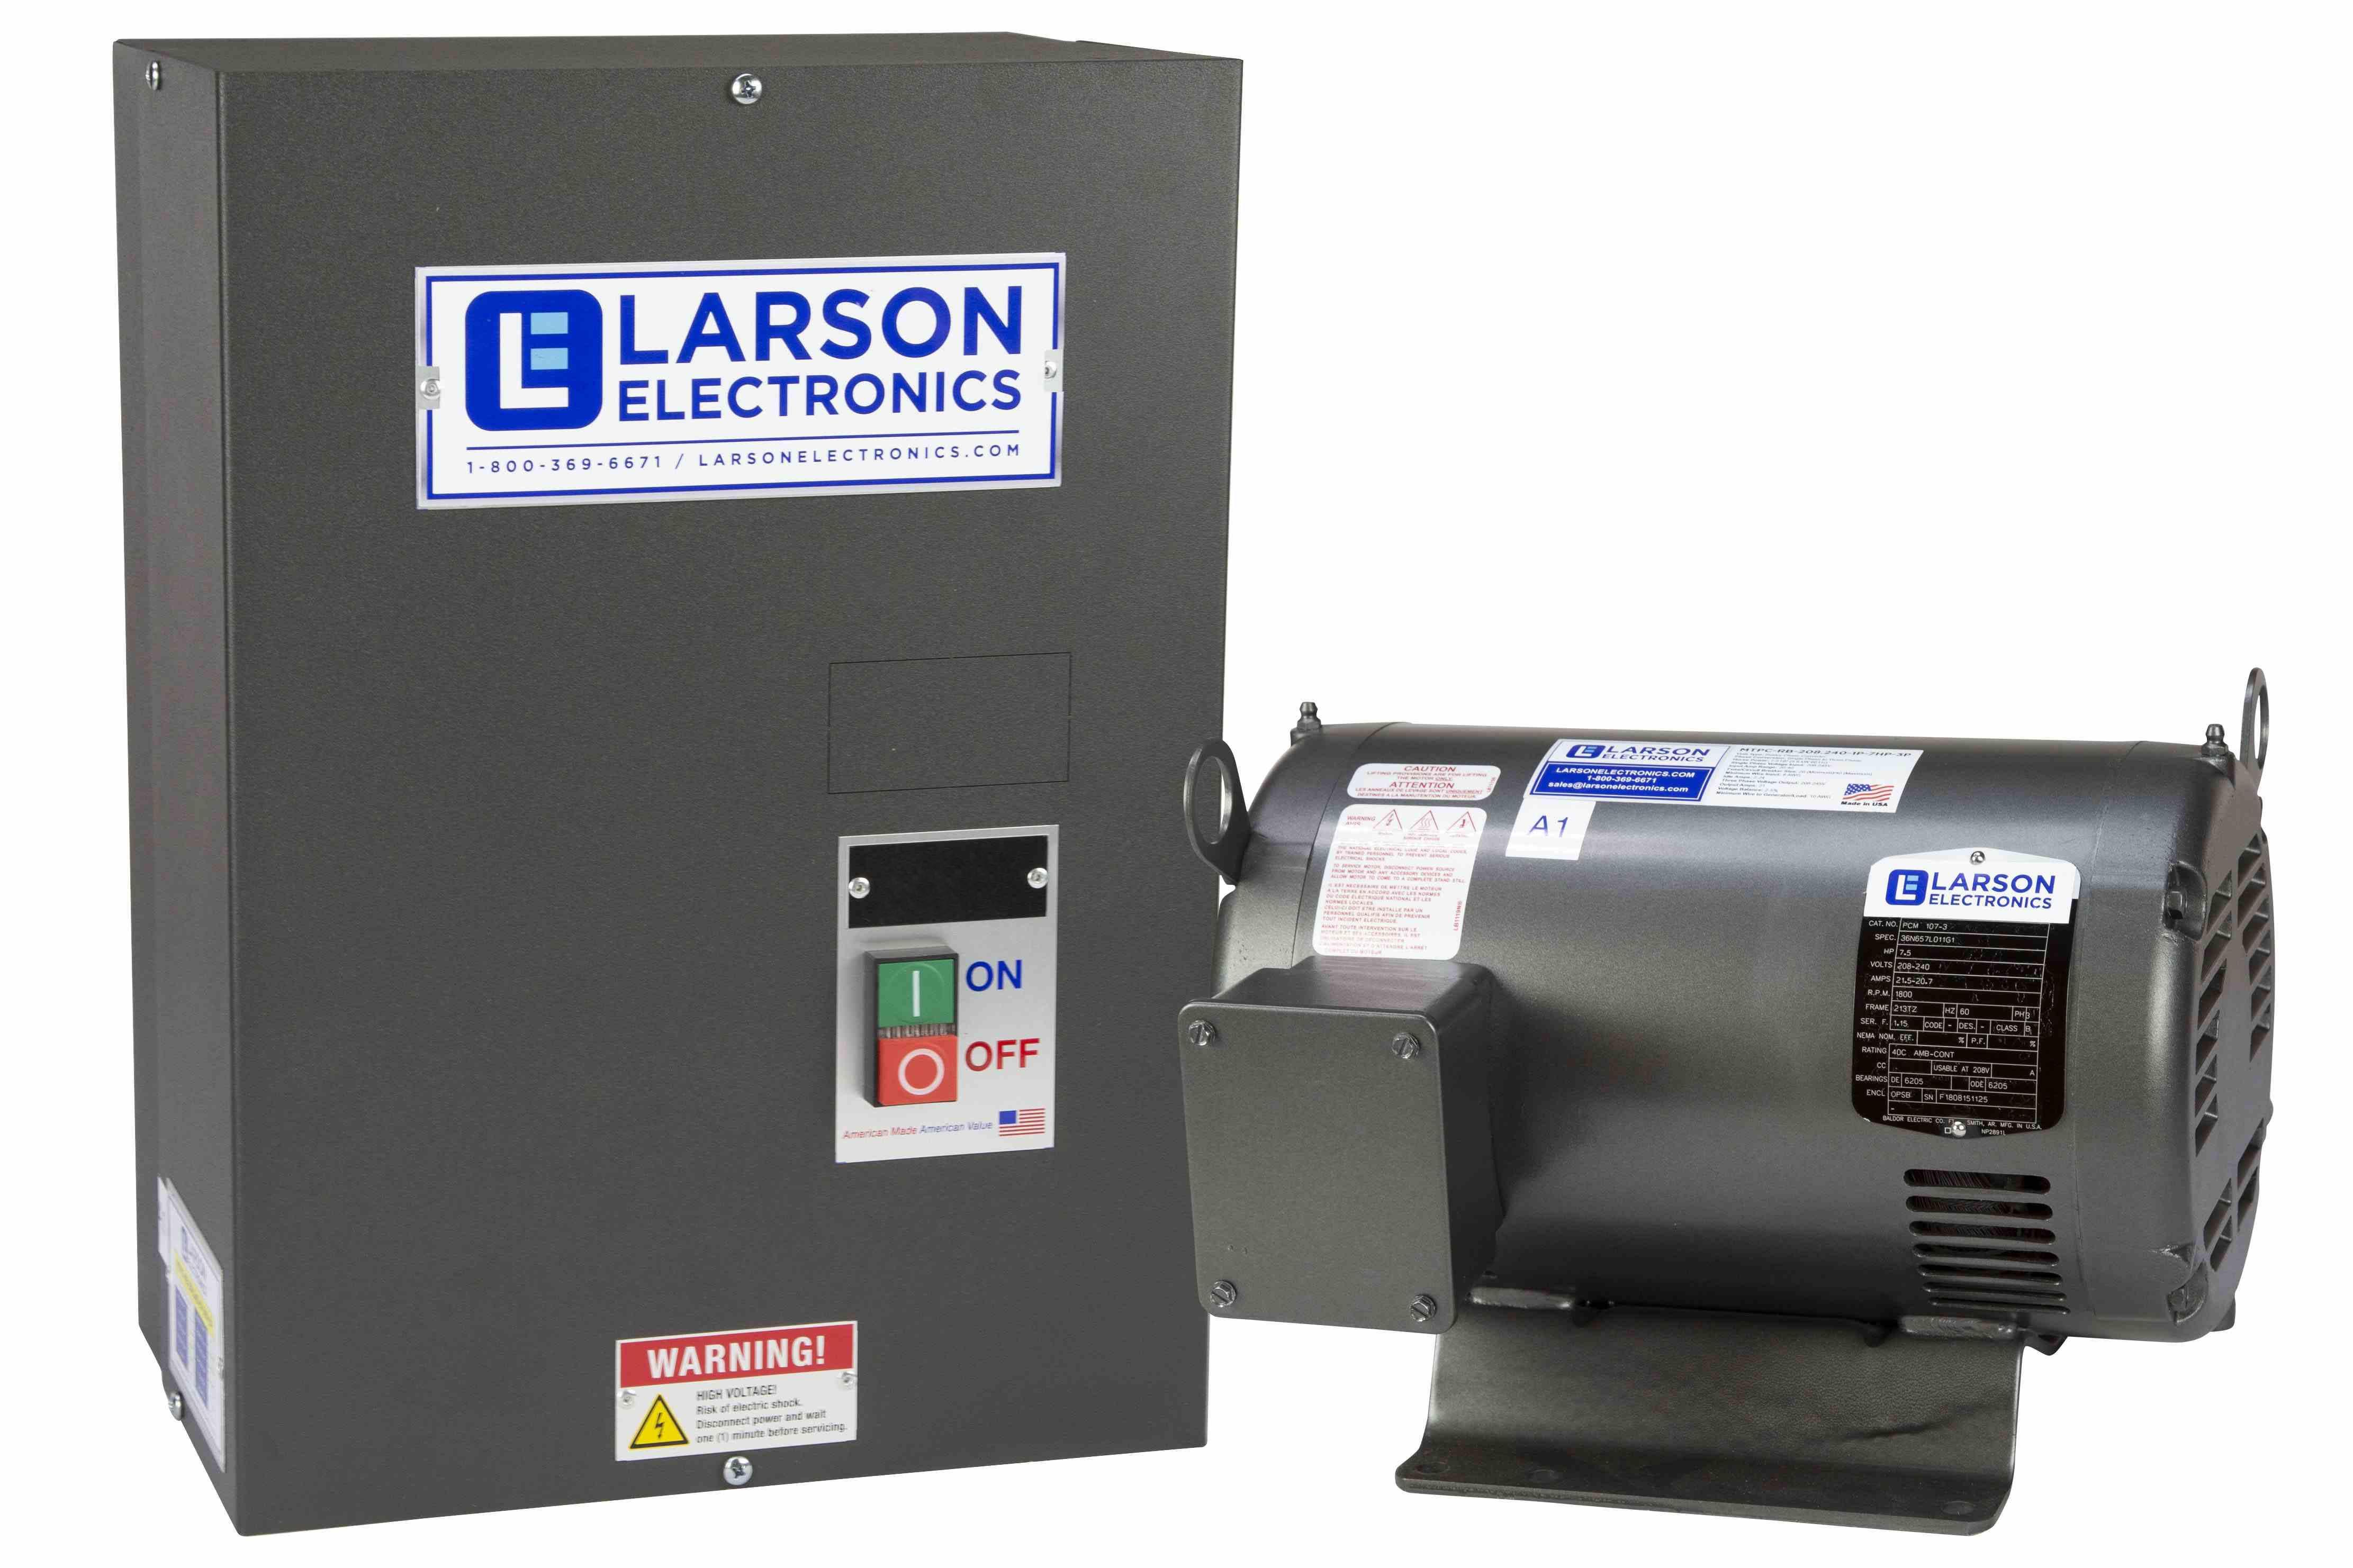 Rotary Phase Converter for 6HP Medium Loads, 440V 1PH to 3PH, 4.25 Amps Output, 10HP Idler, NEMA 1